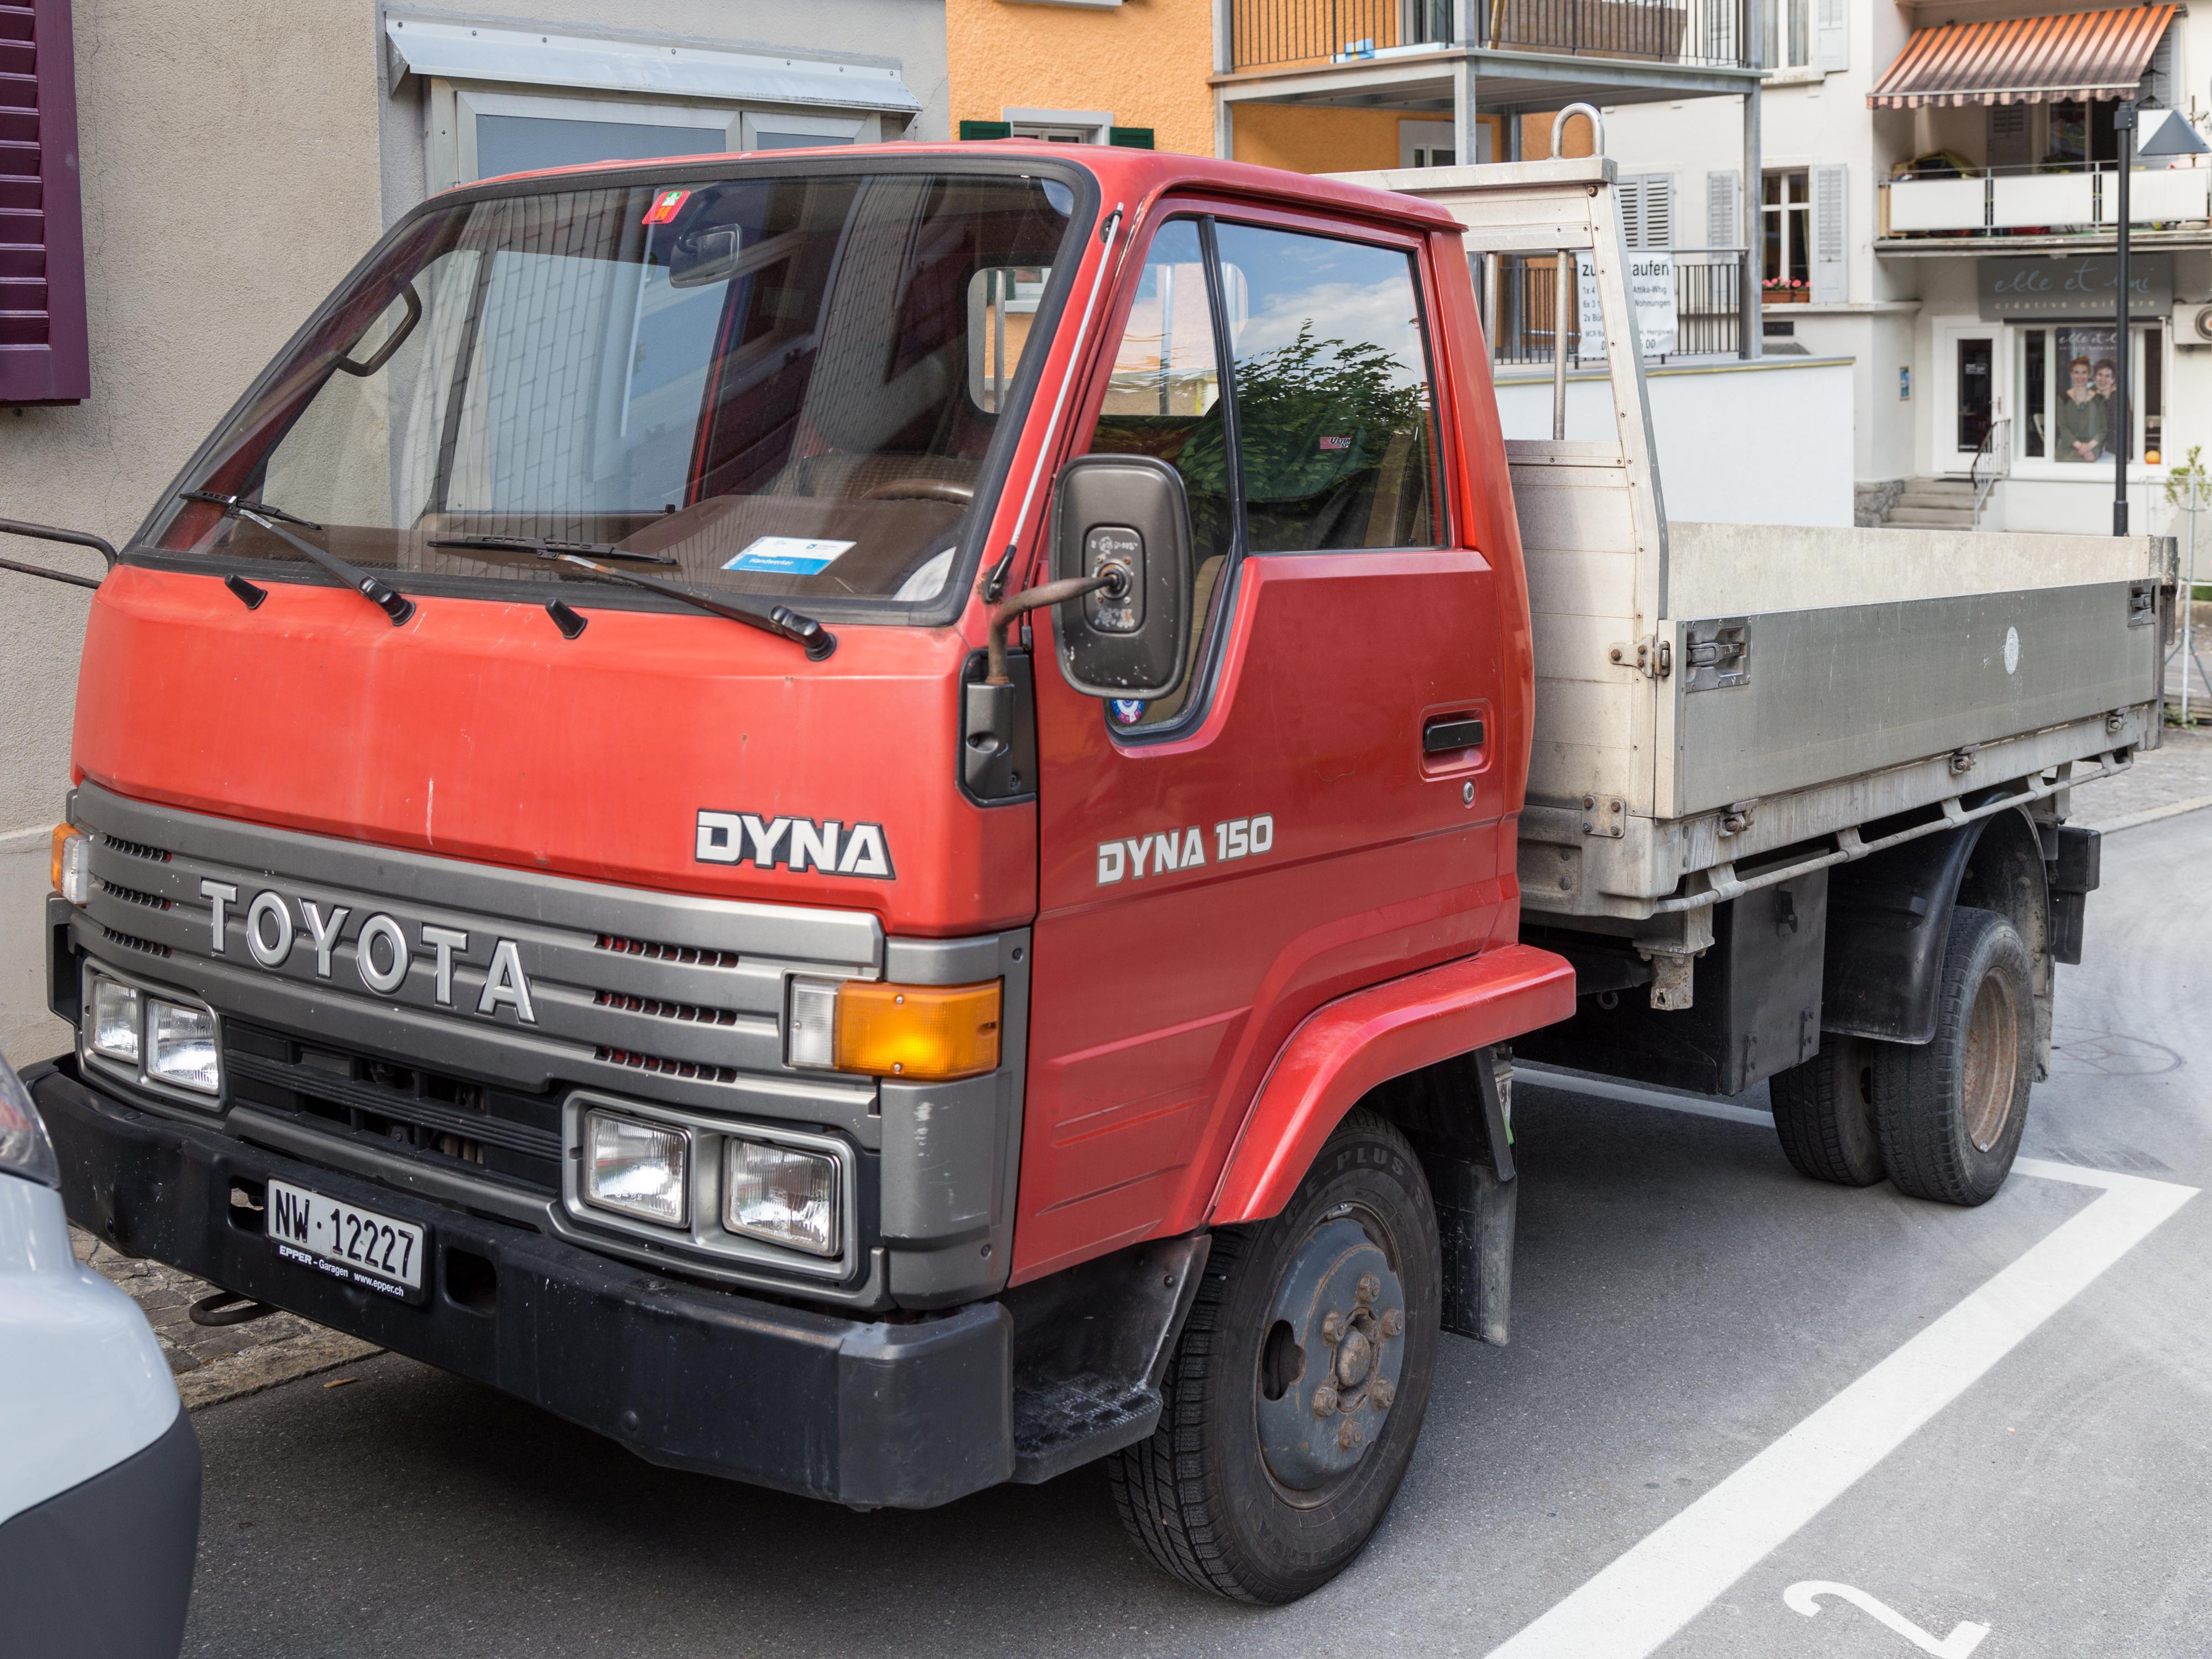 Kelebihan Toyota Dyna Murah Berkualitas